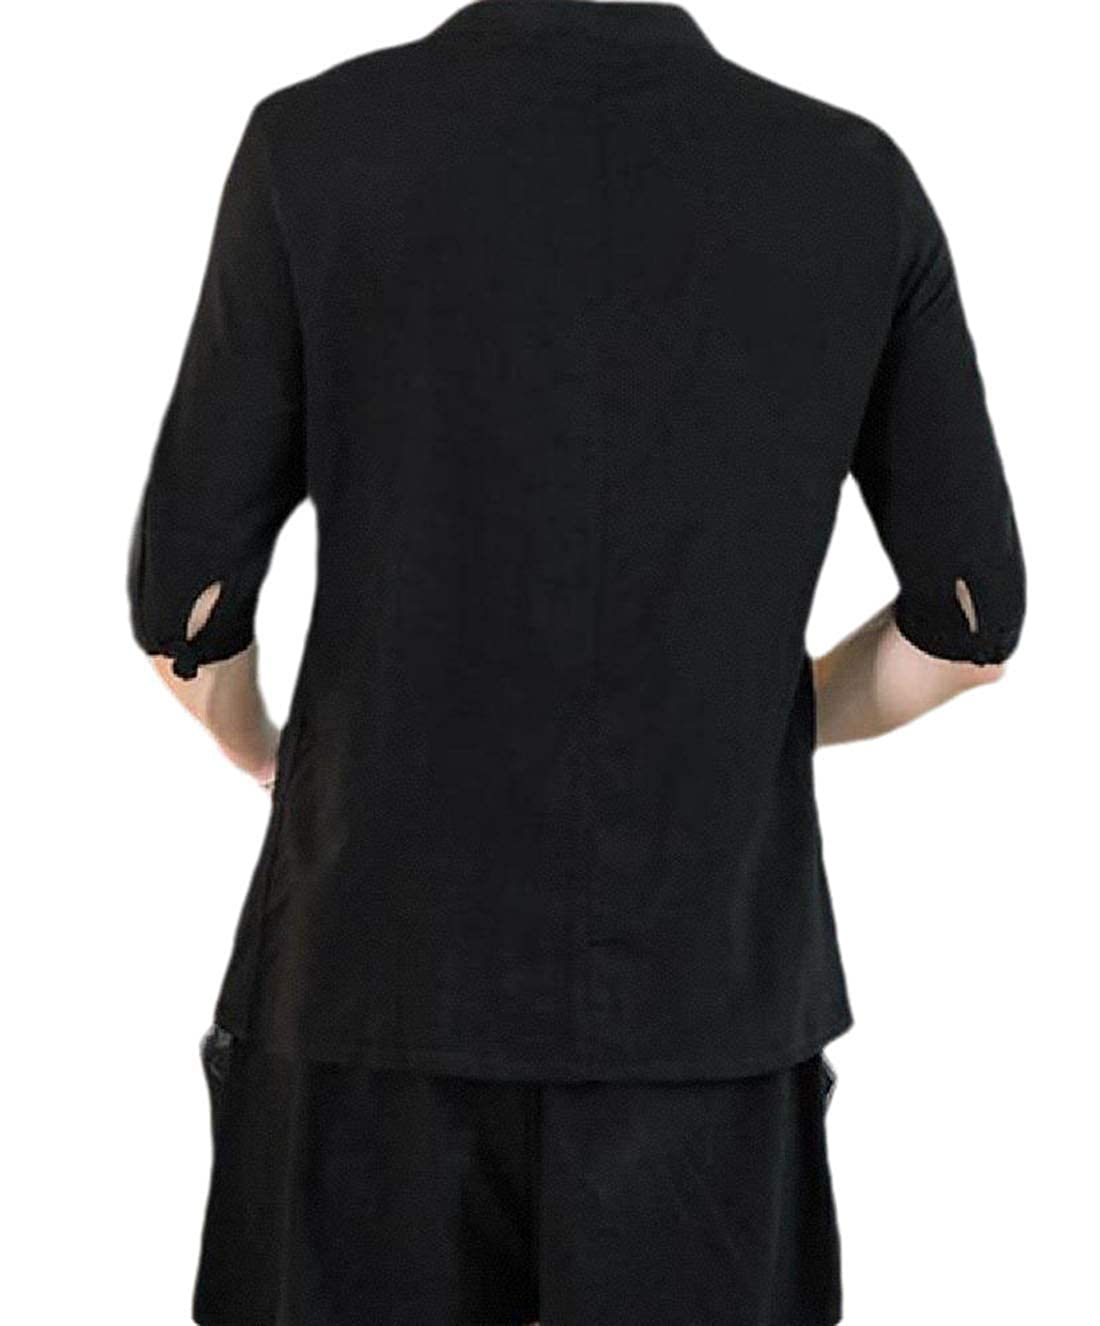 HEFASDM Mens Linen Tang Suit 3//4 Sleeve Casual Pure Colour Western Shirt